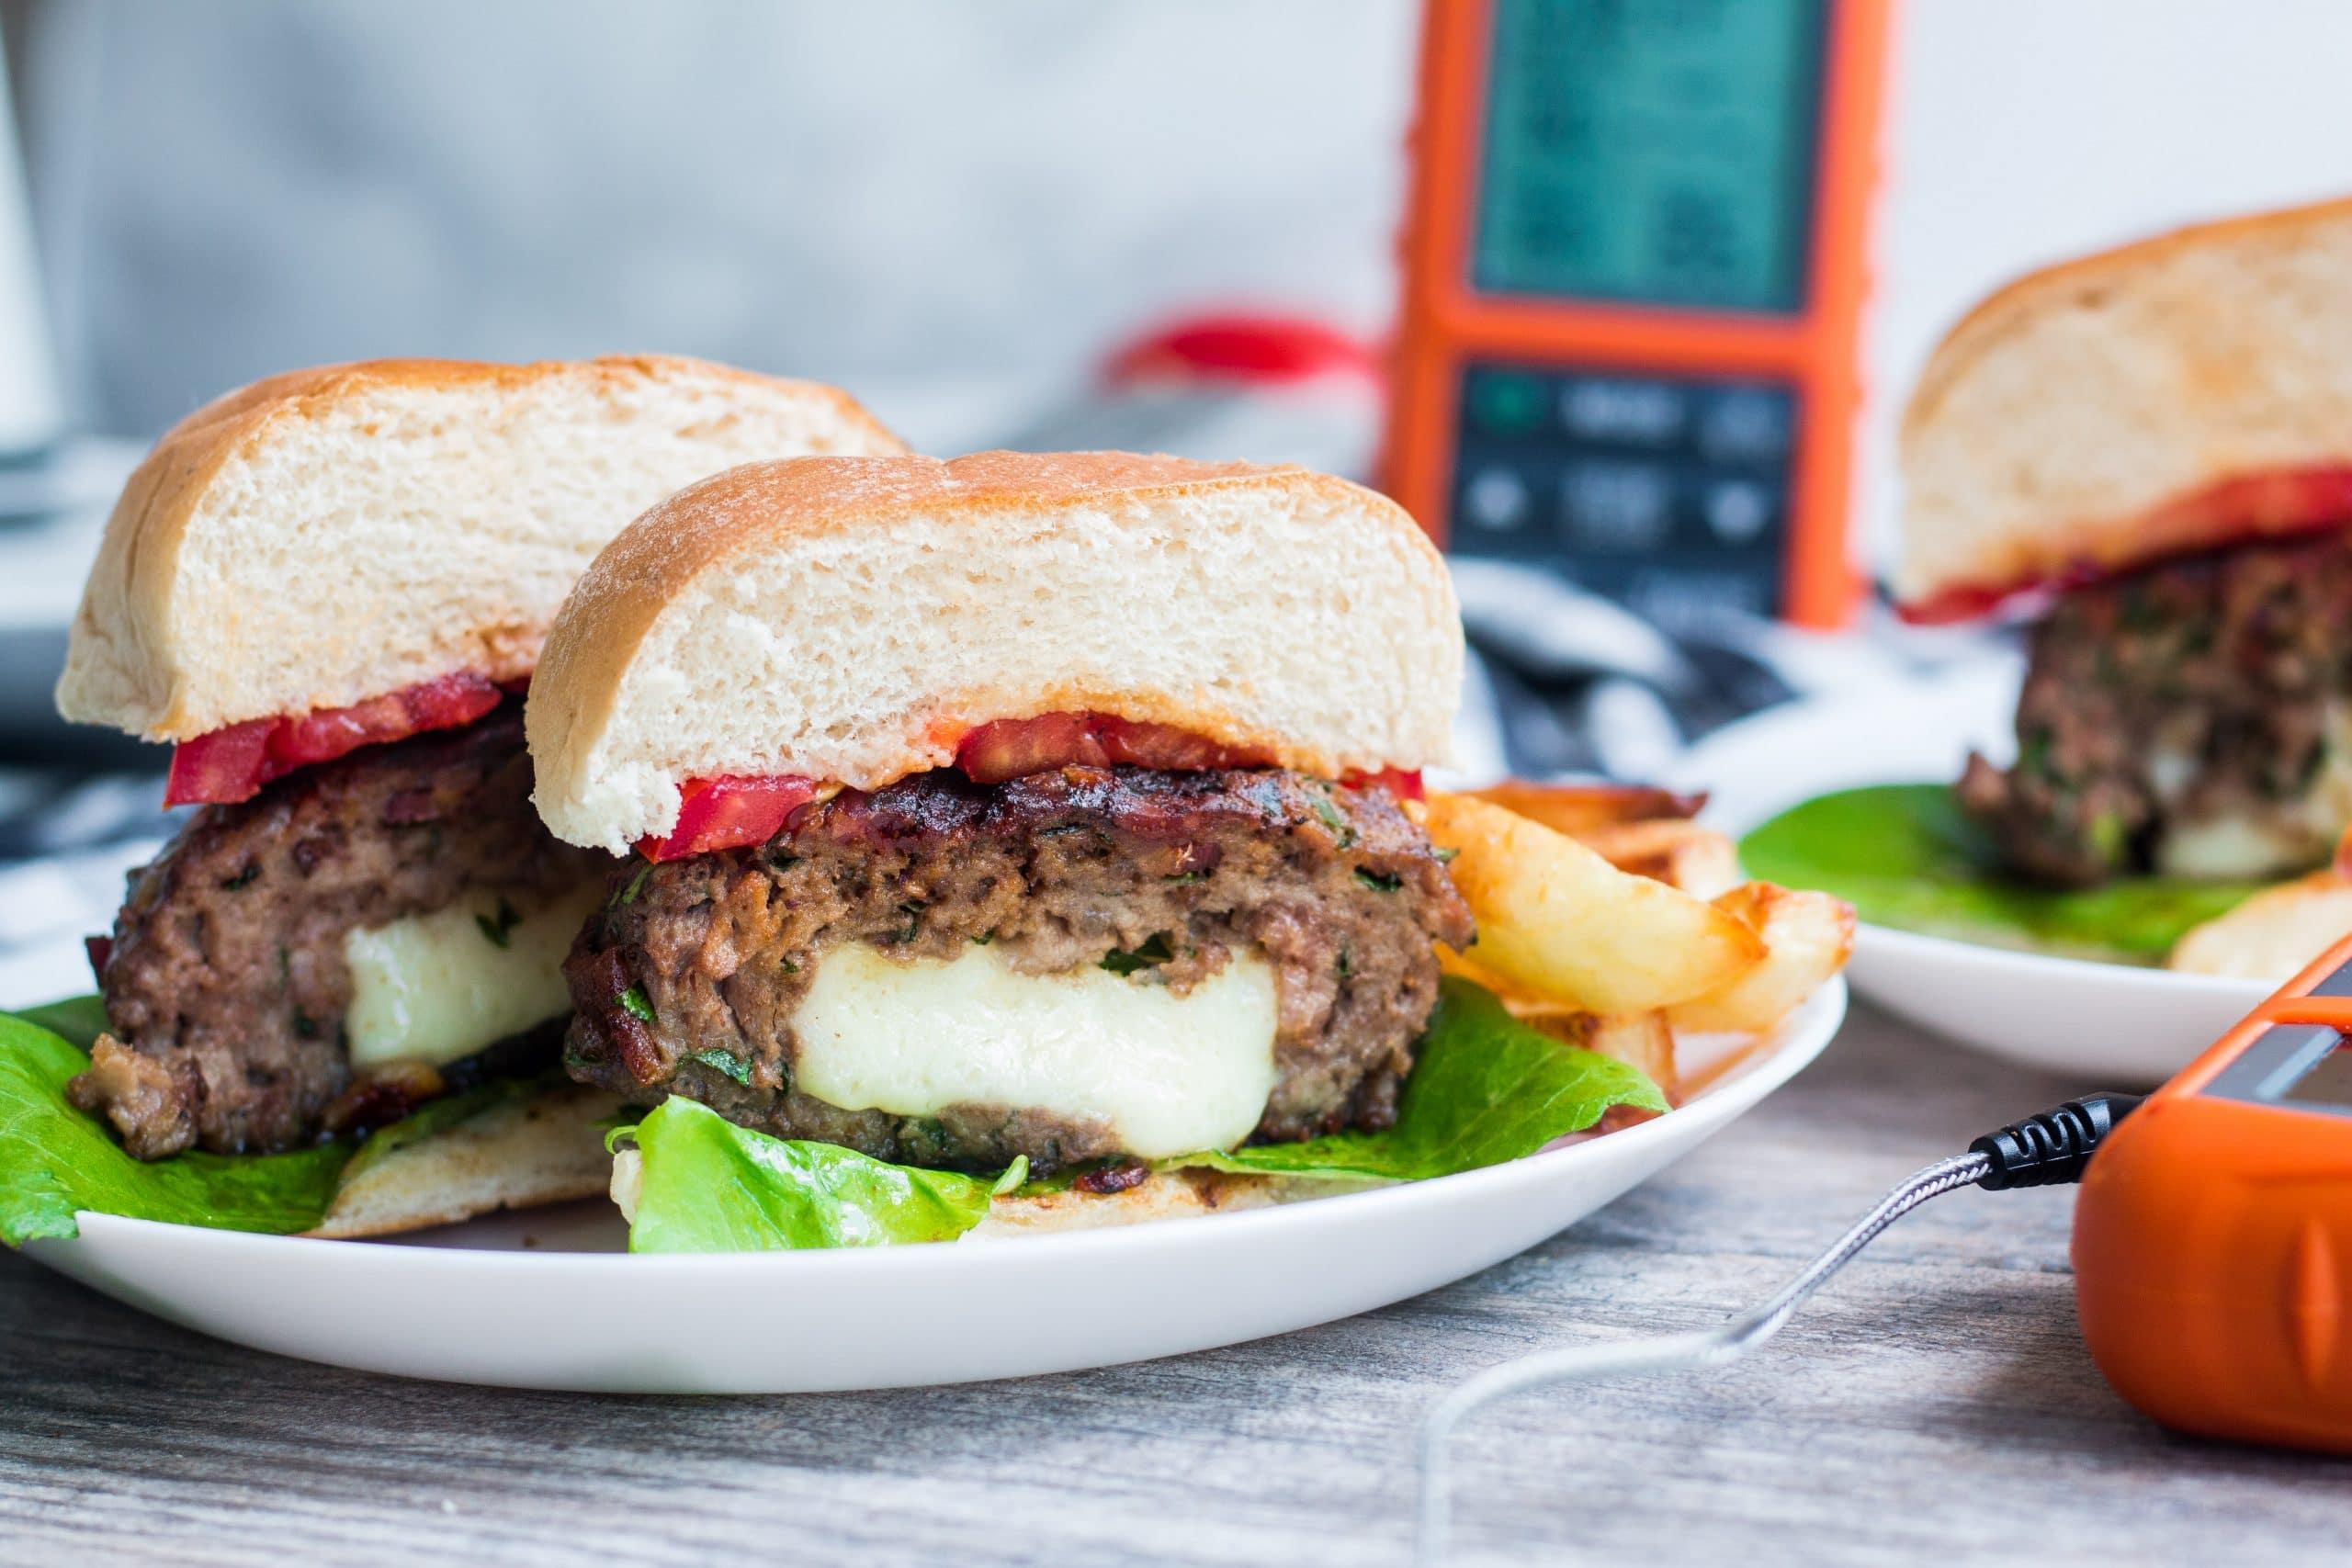 ThermoPro Recipe Cheddar Stuffed Burgers